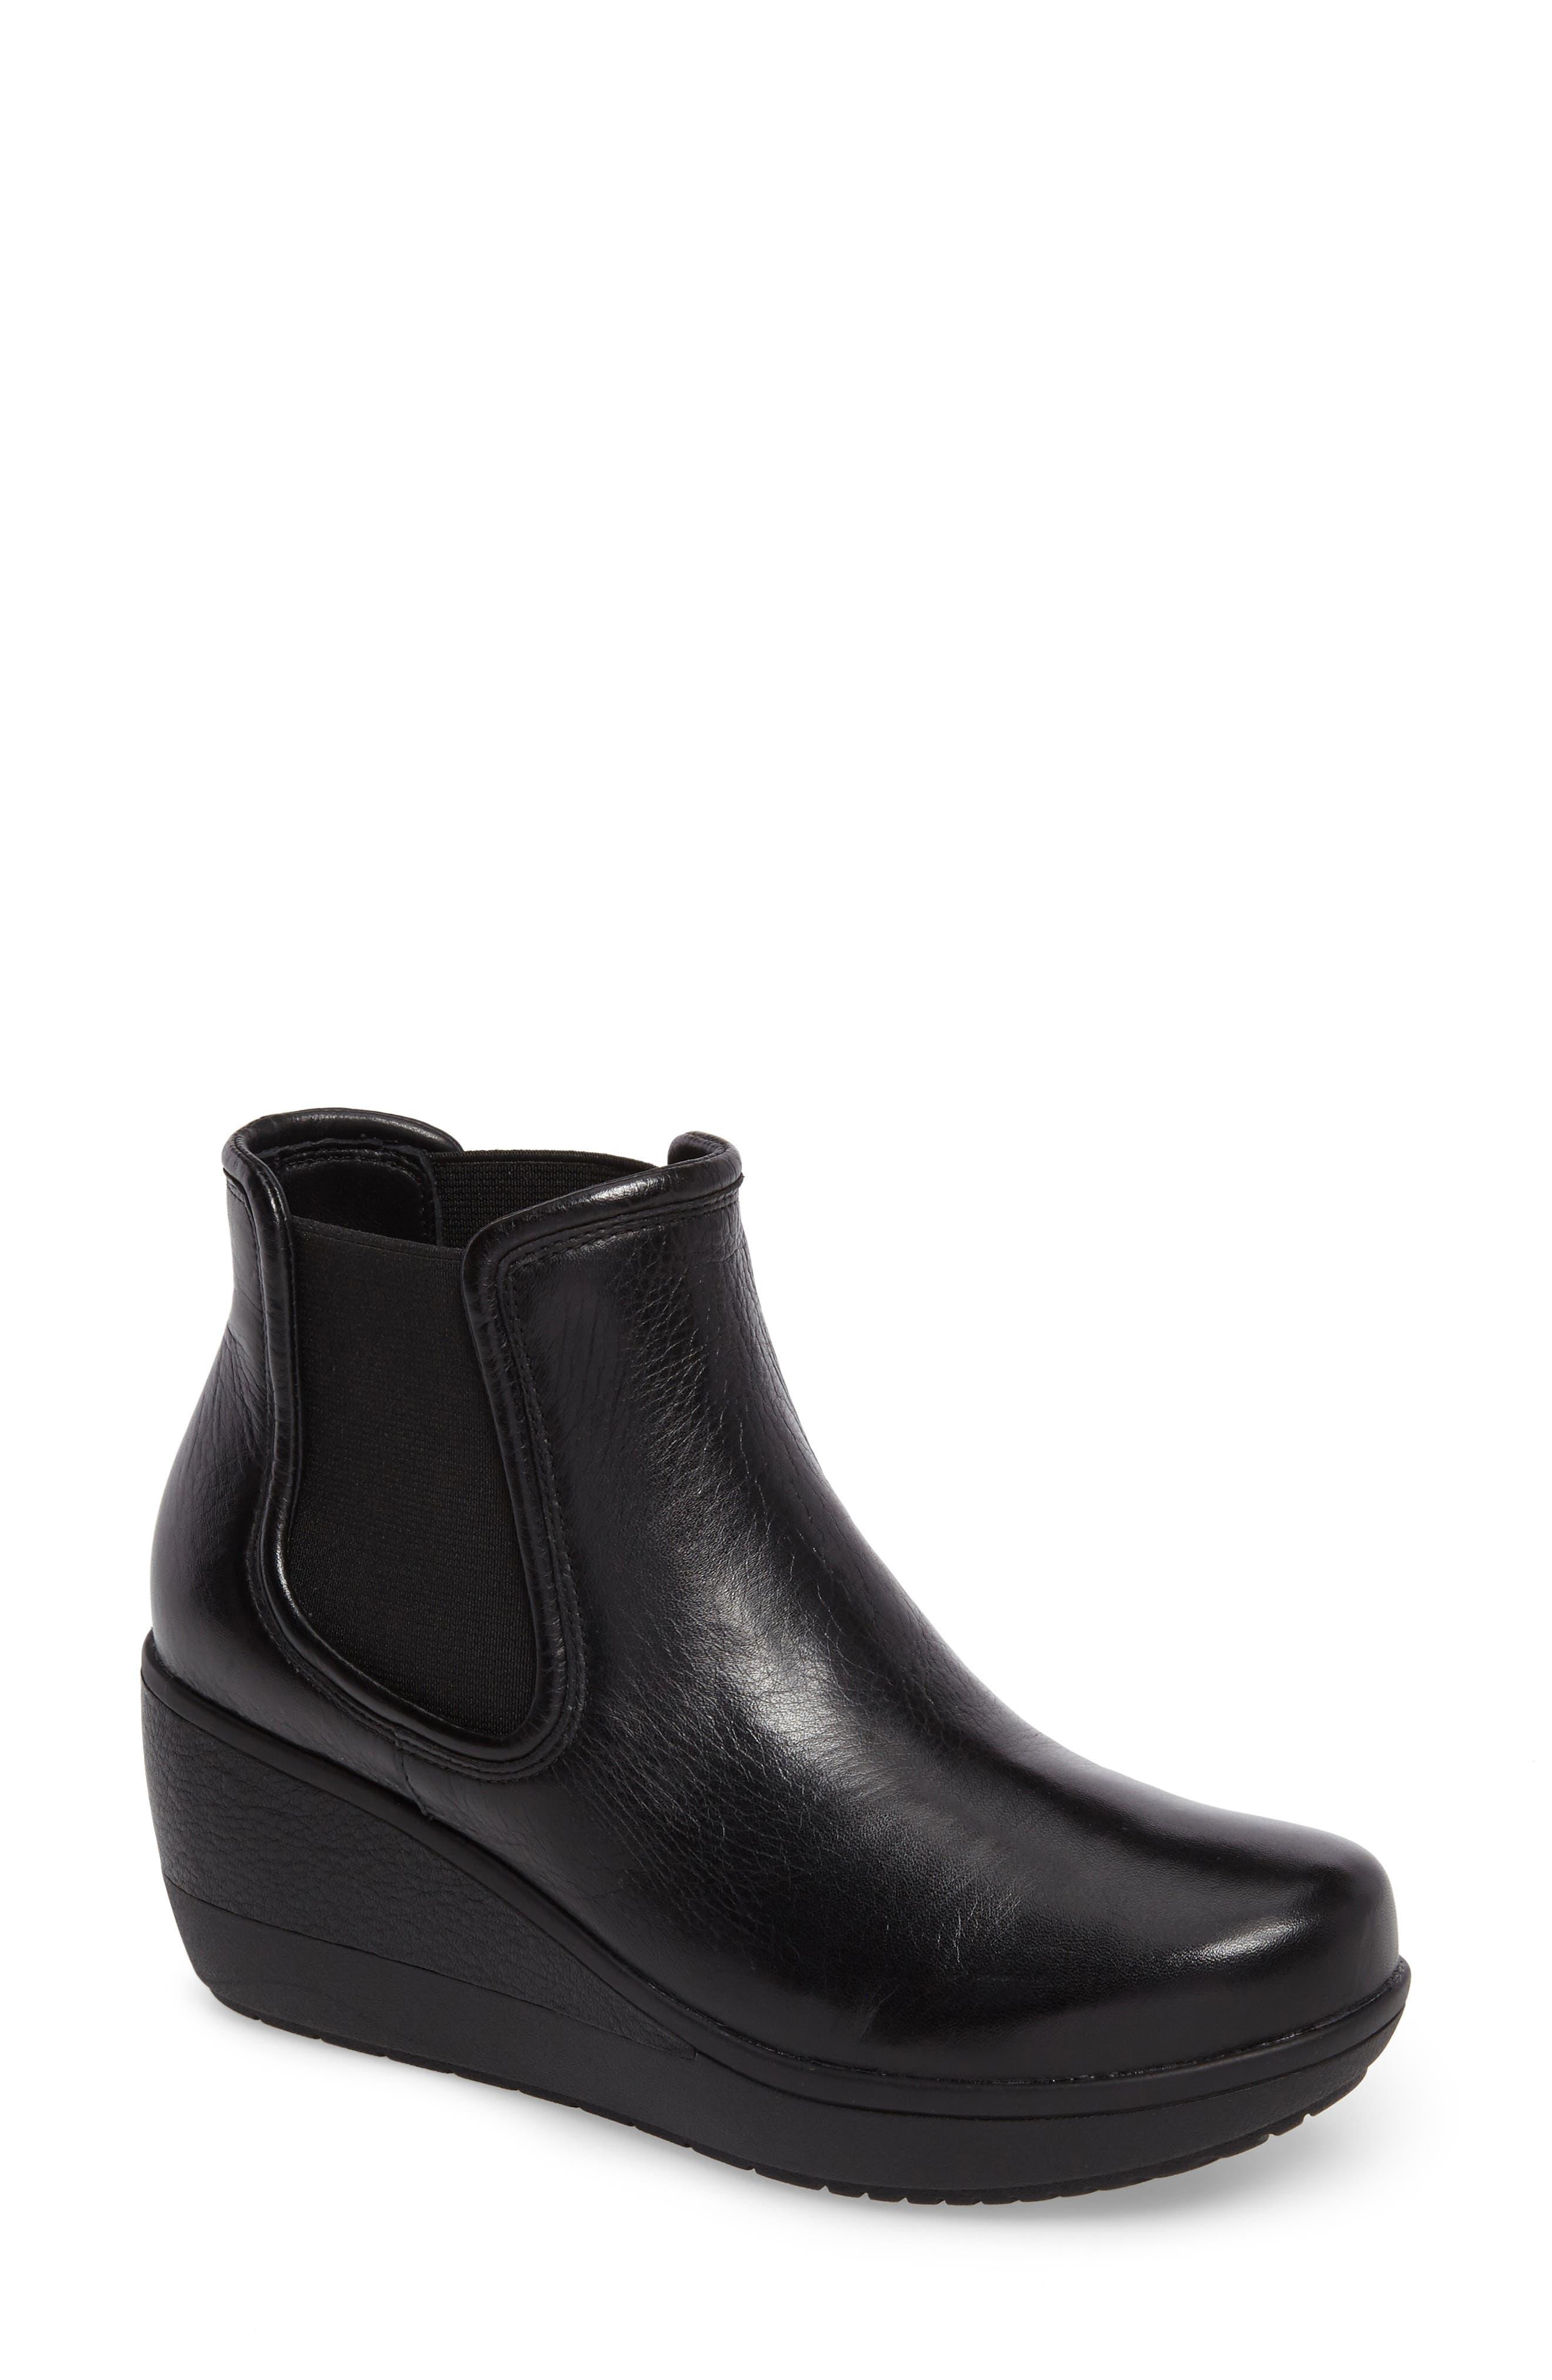 Main Image - Clarks® Wynnmere Mara Boot (Women)